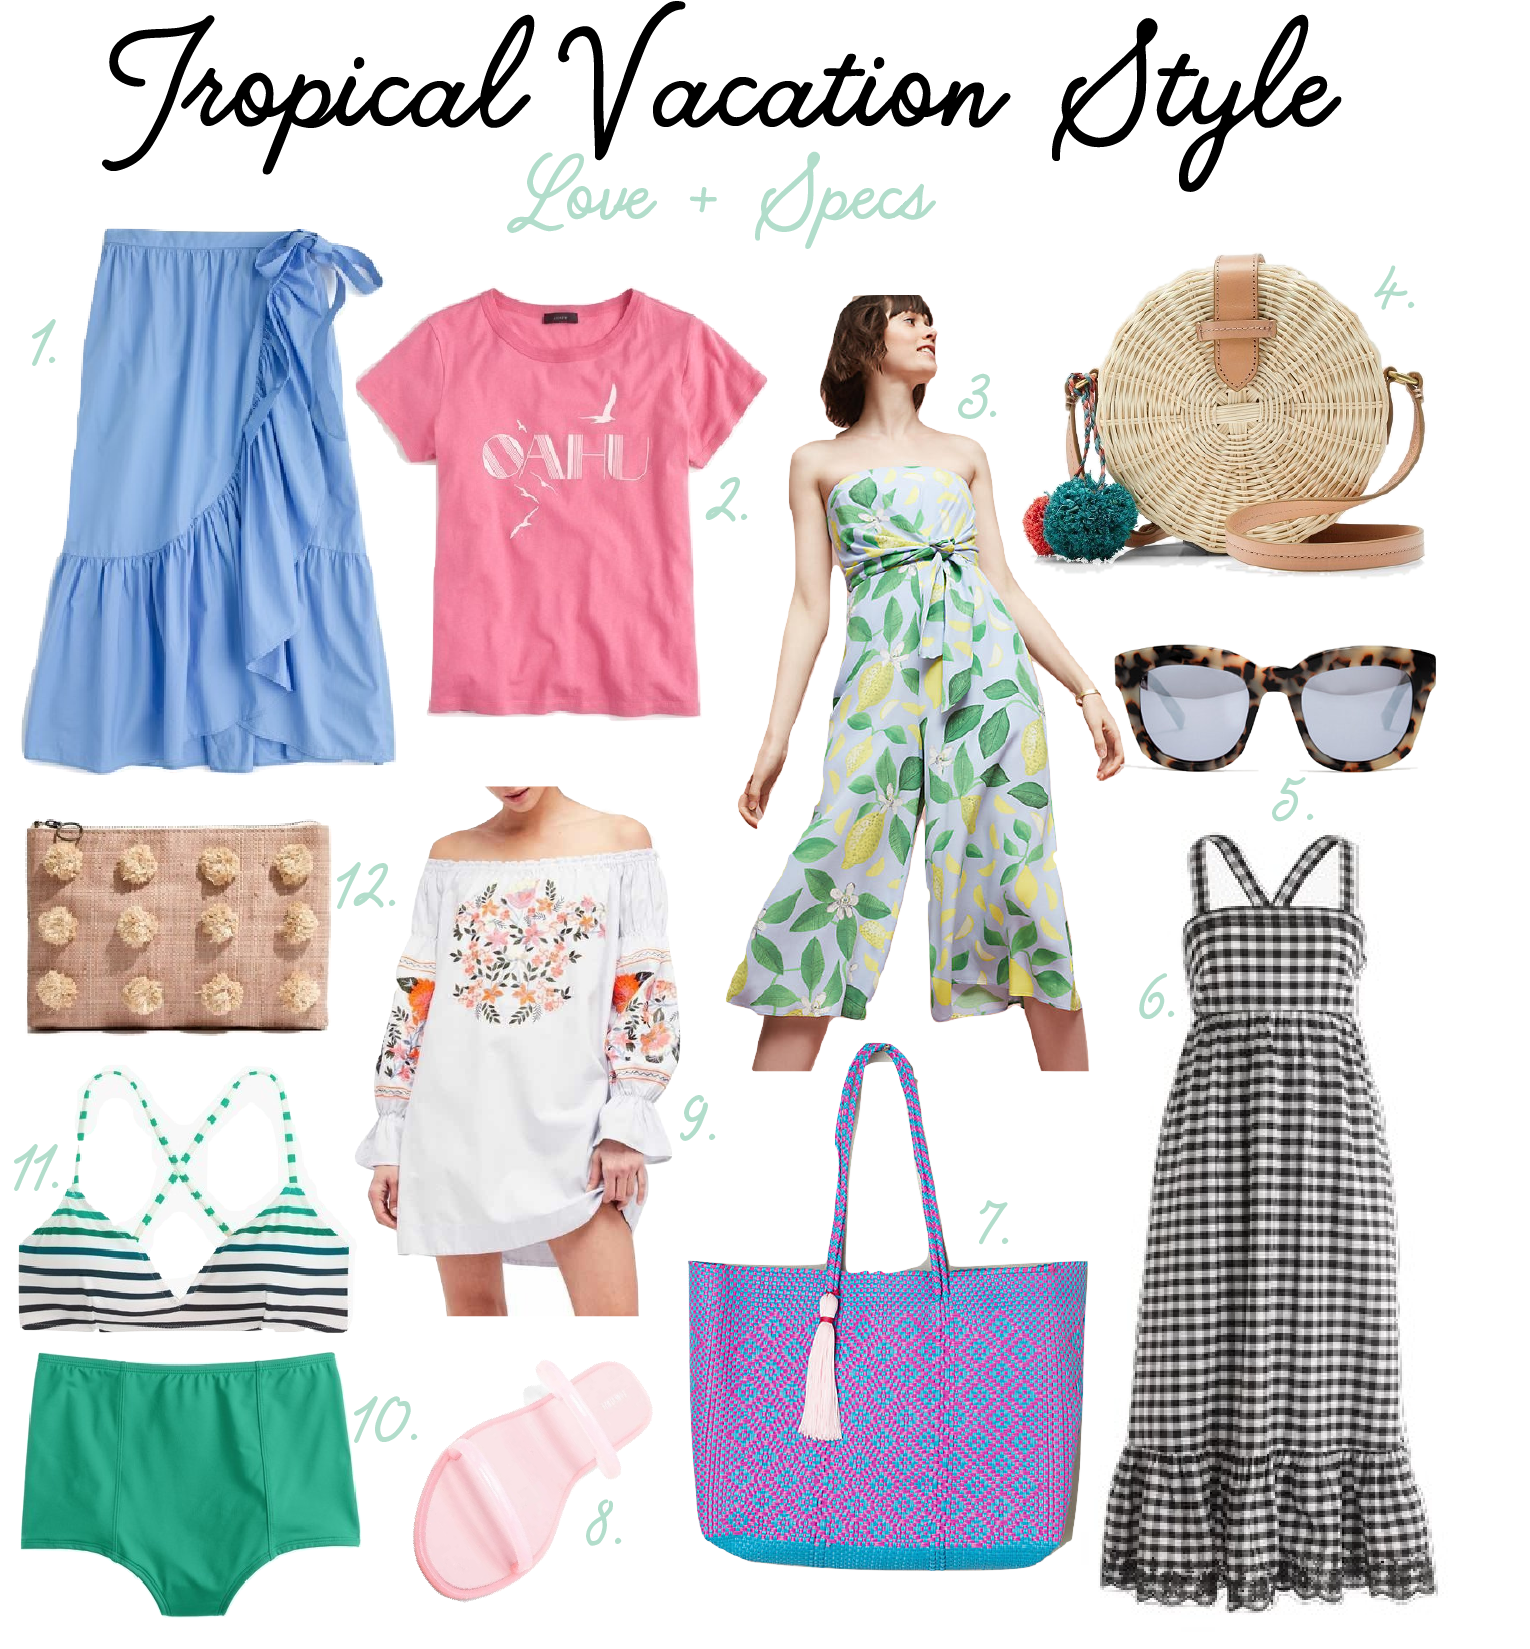 Caribbean-Vacation-Style.jpg